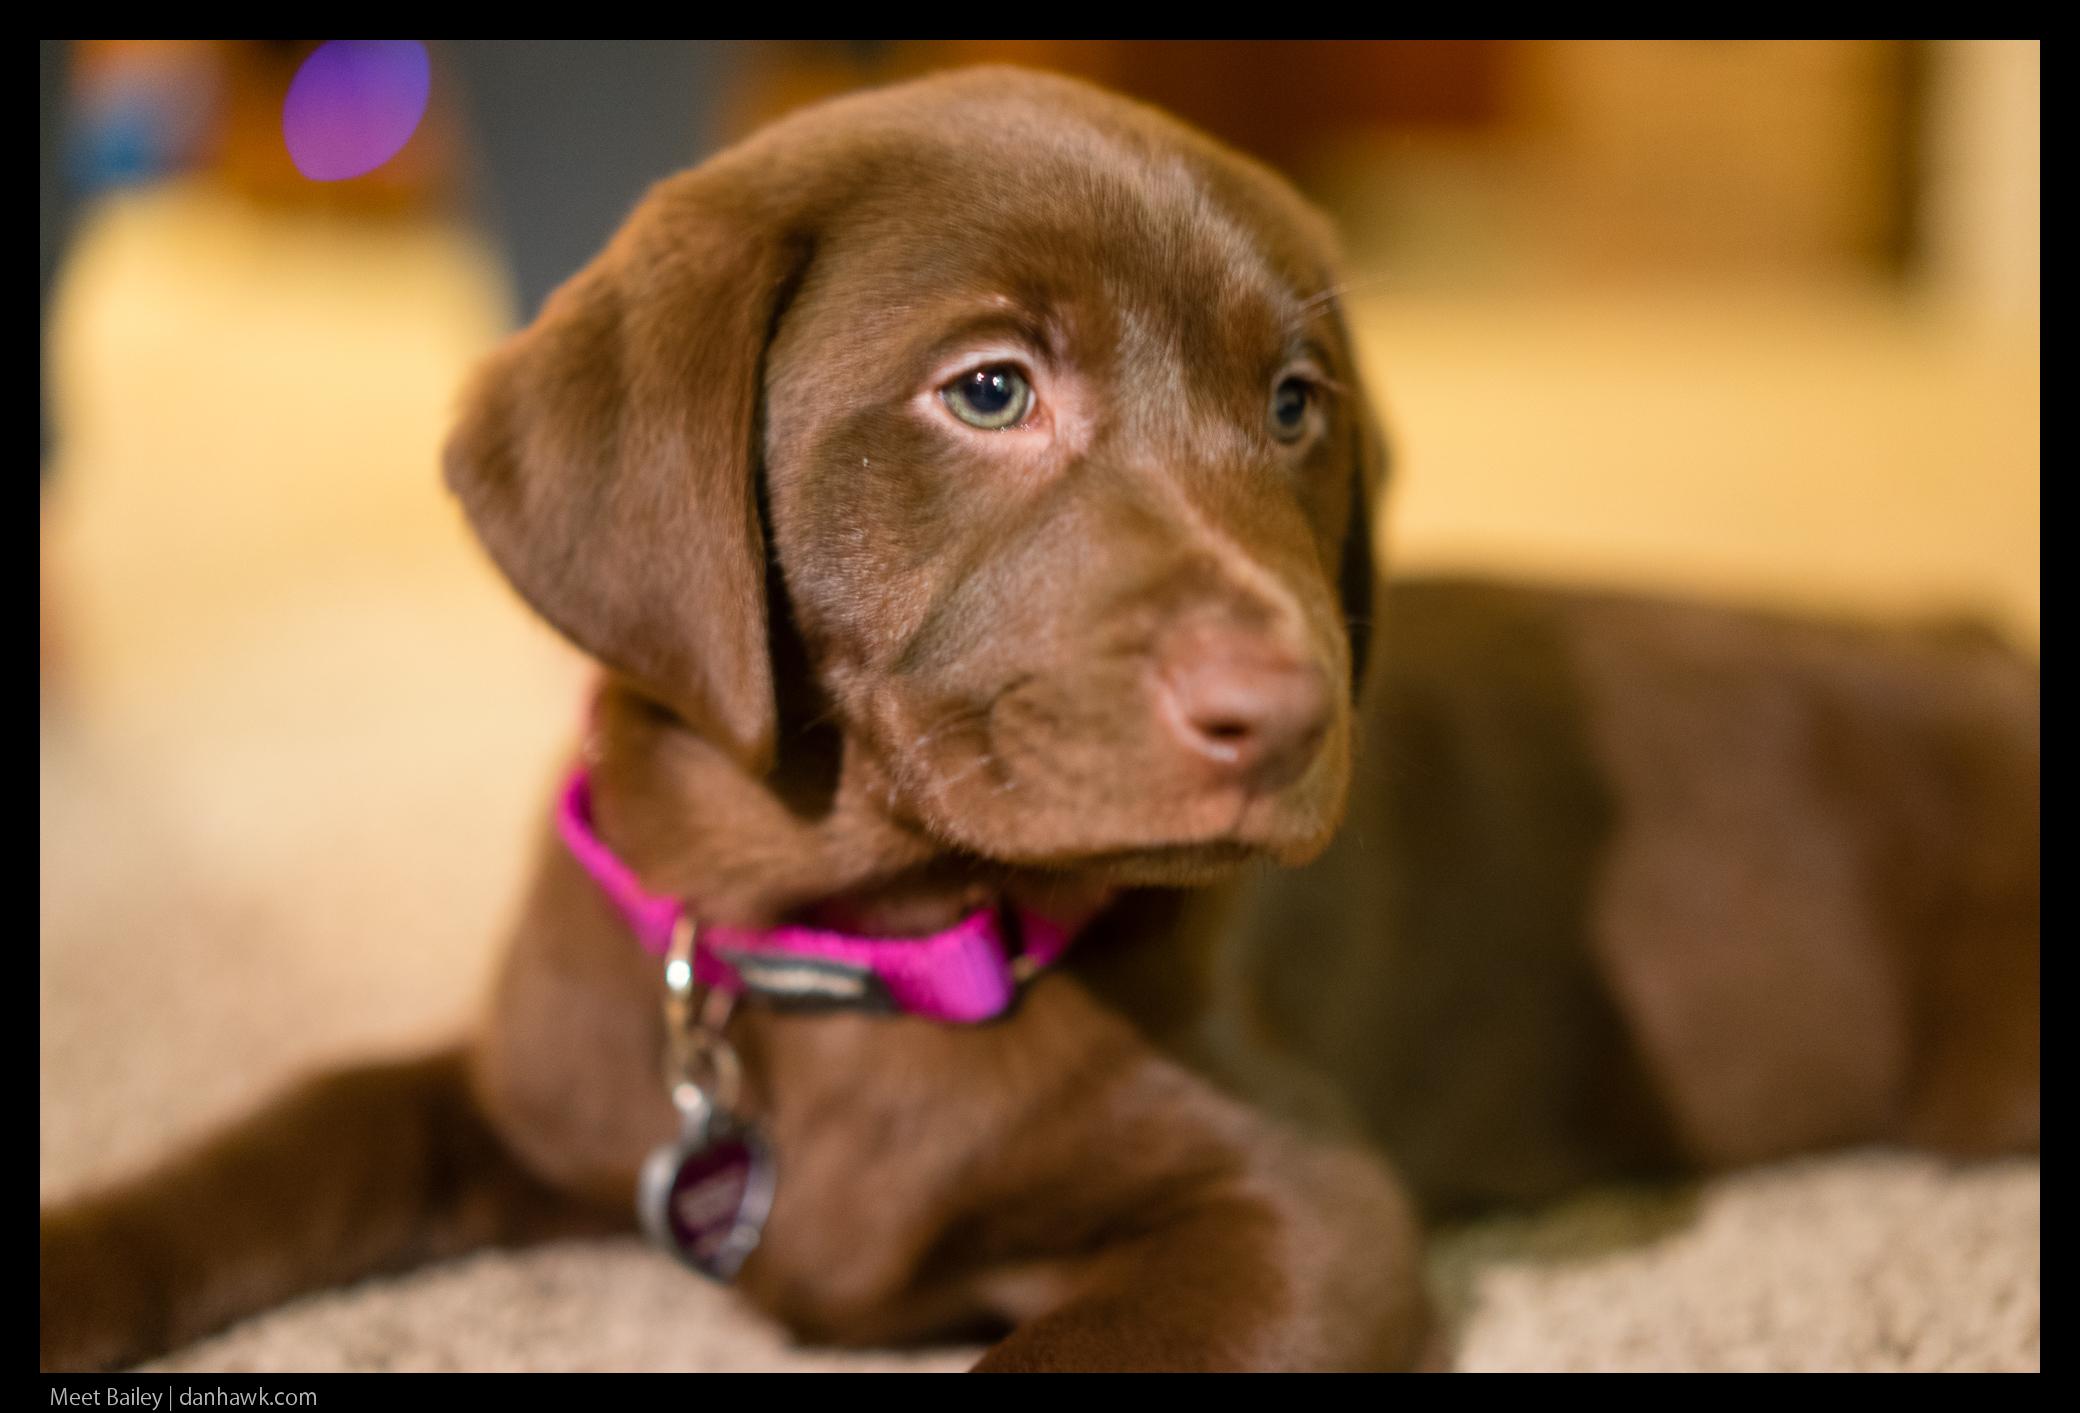 Meet Bailey